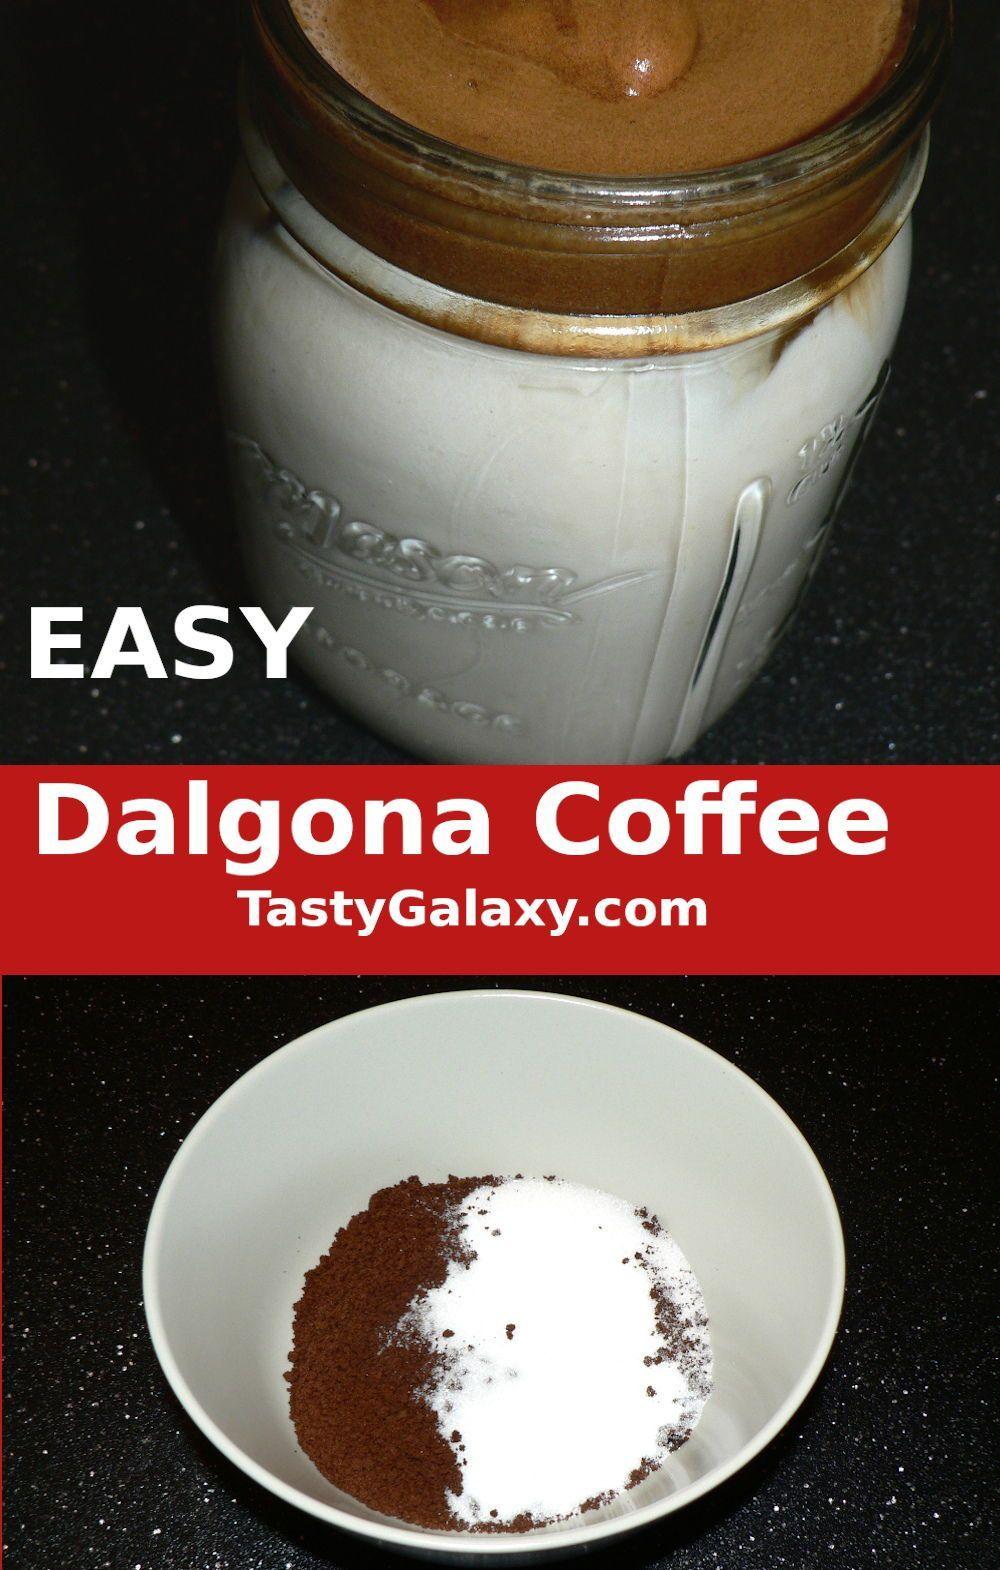 EASY Dalgona Coffee Recipe in 2020 Interesting food